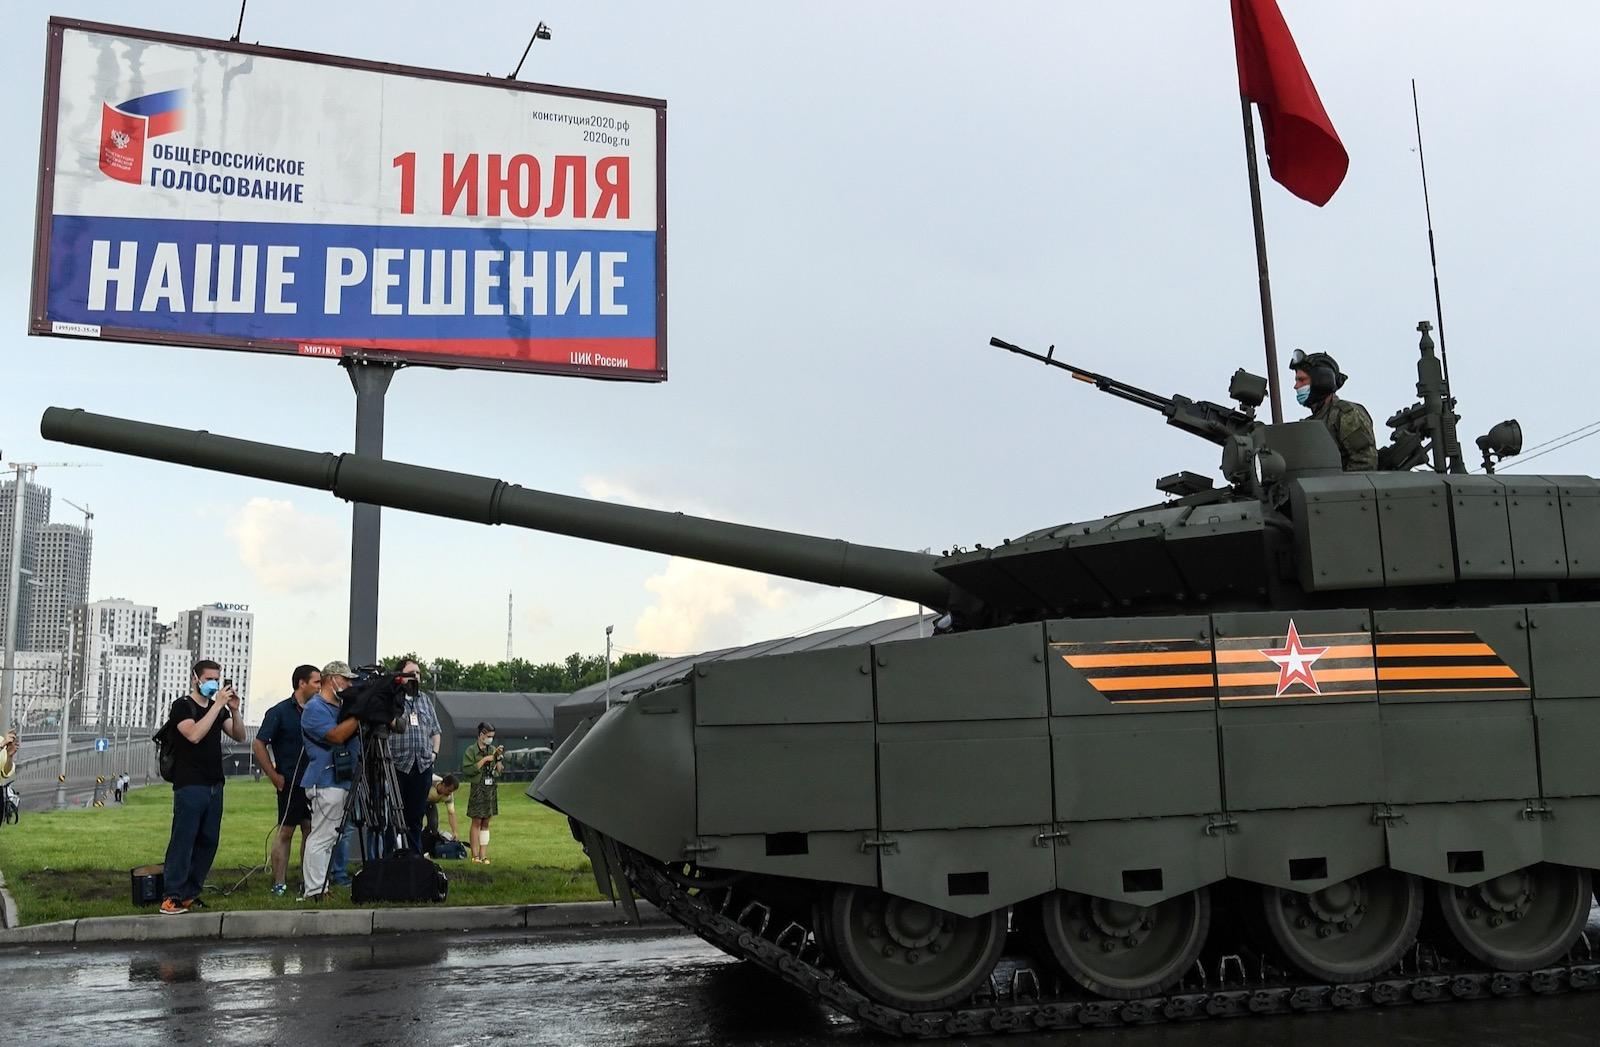 Ruské refendum pod hlavňami Armaty